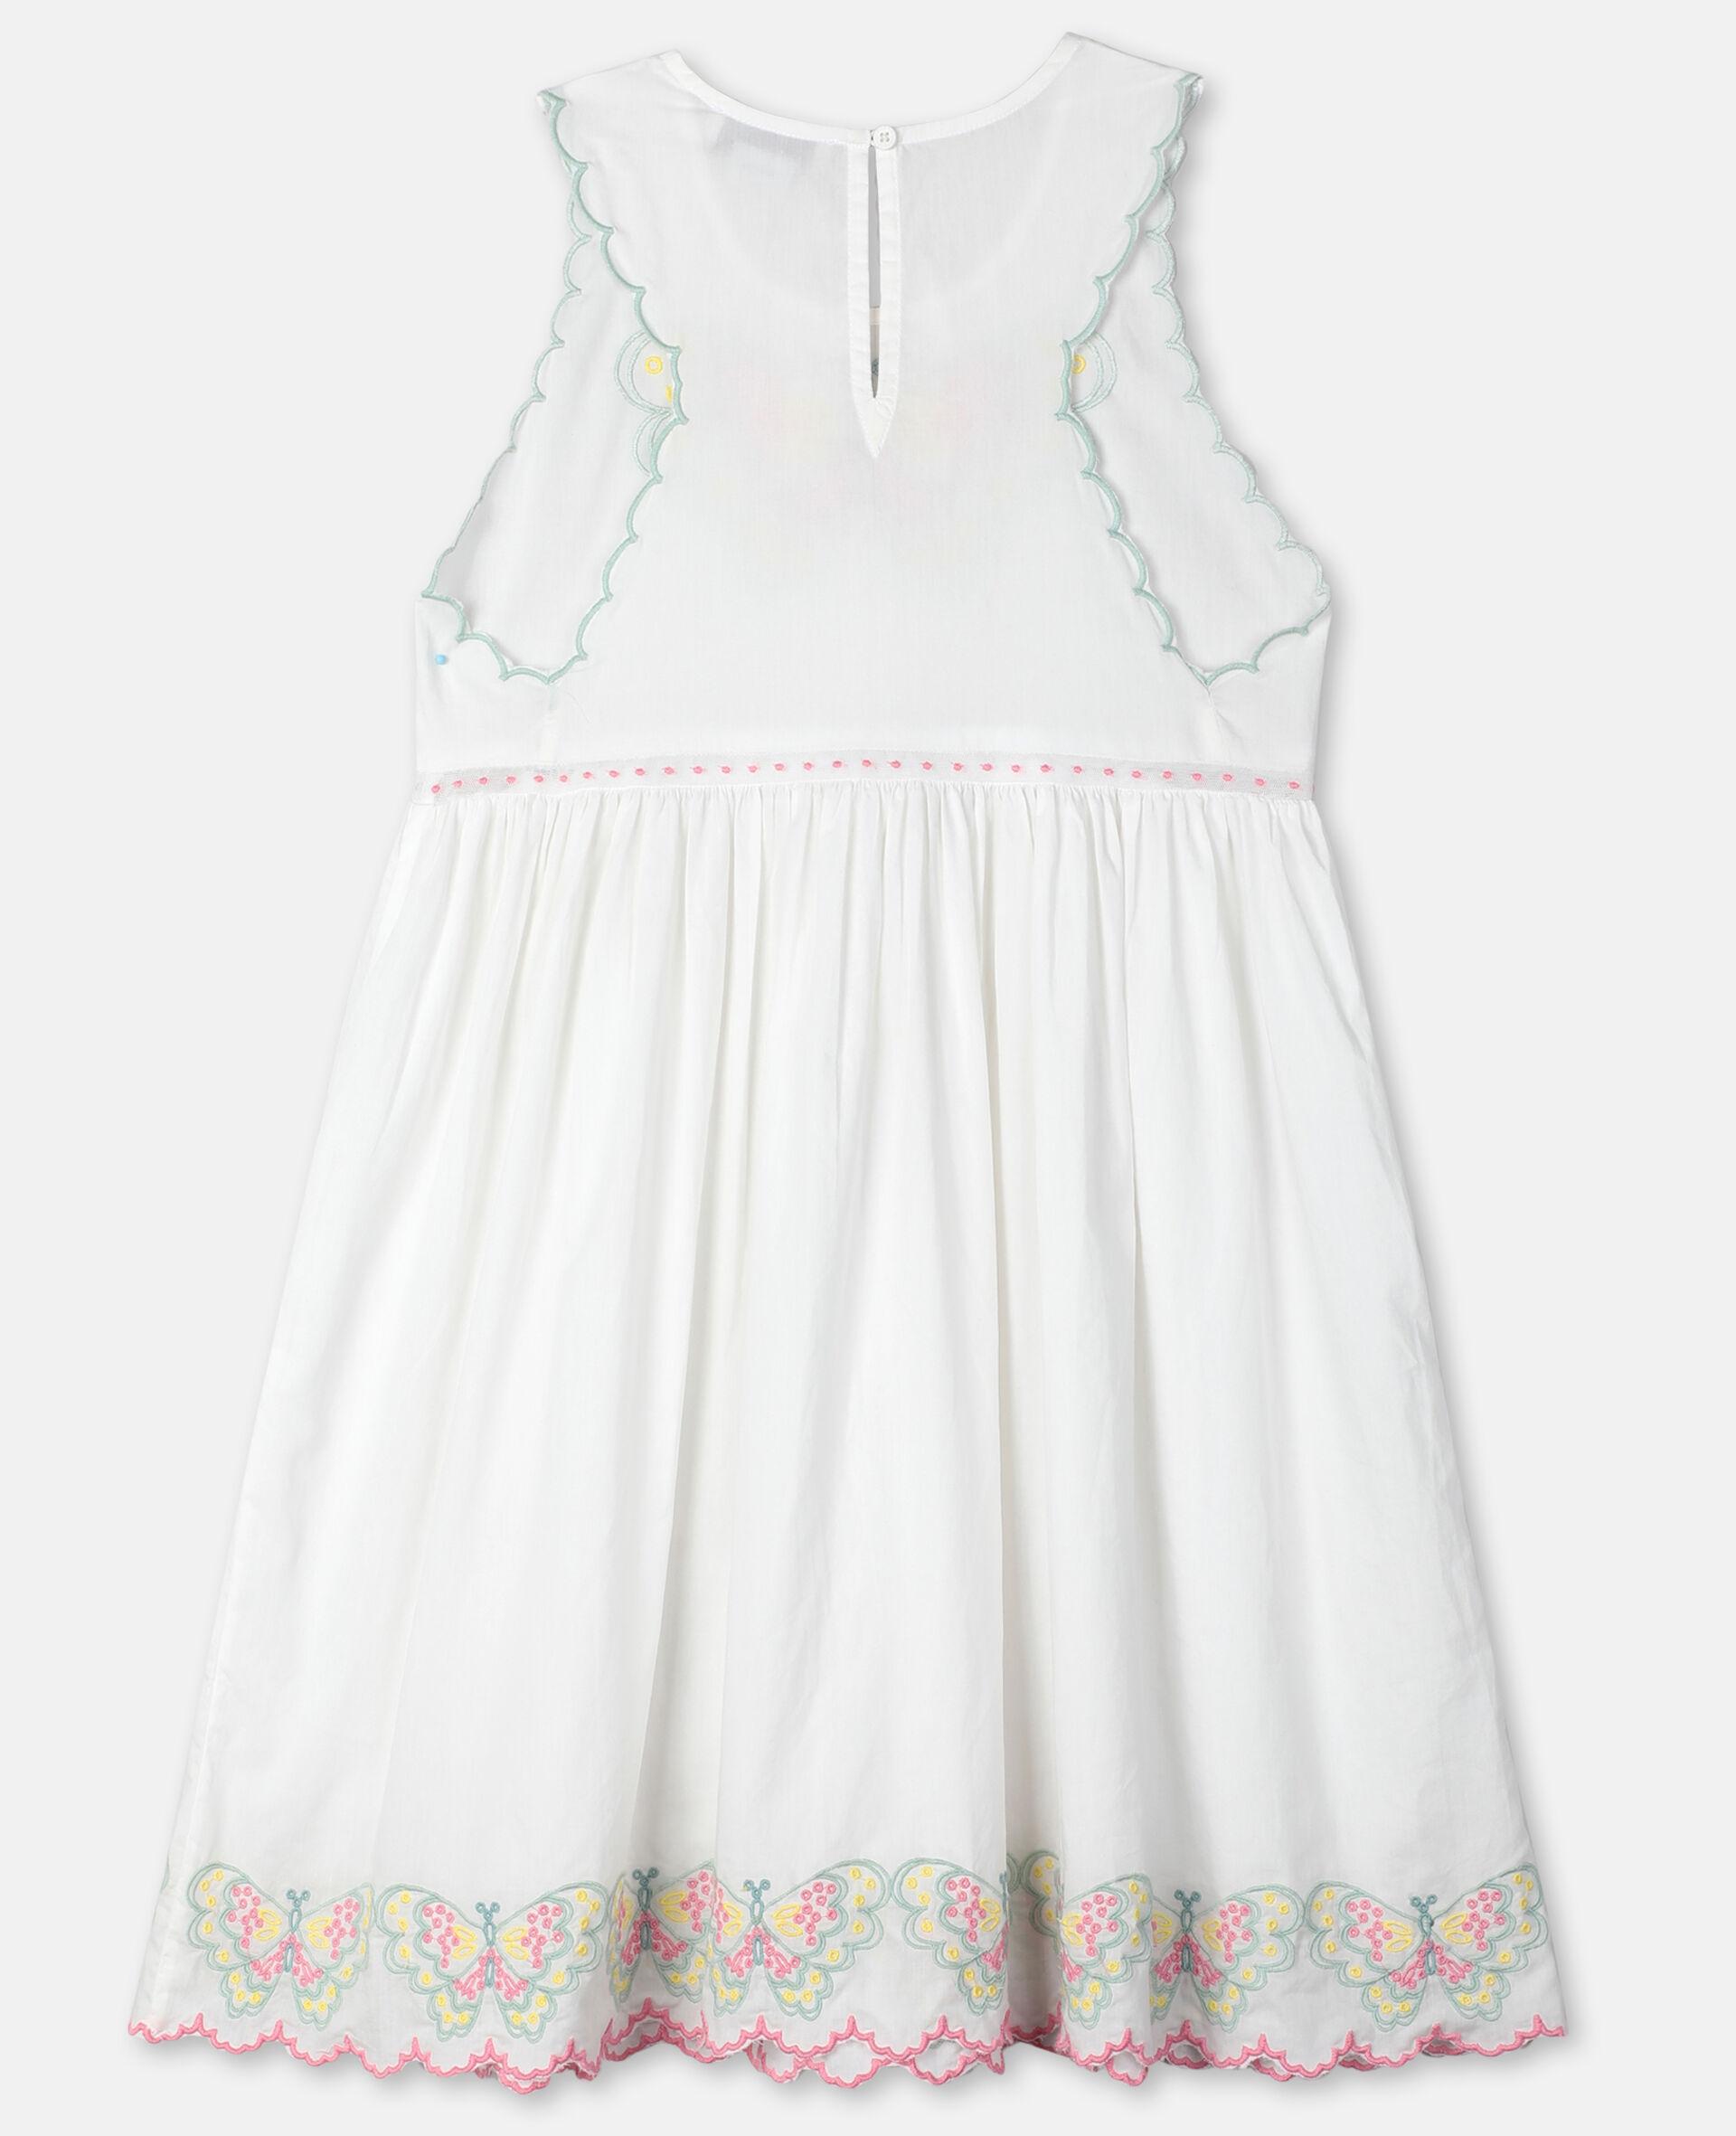 Butterfly刺绣棉质连衣裙-白色-large image number 3